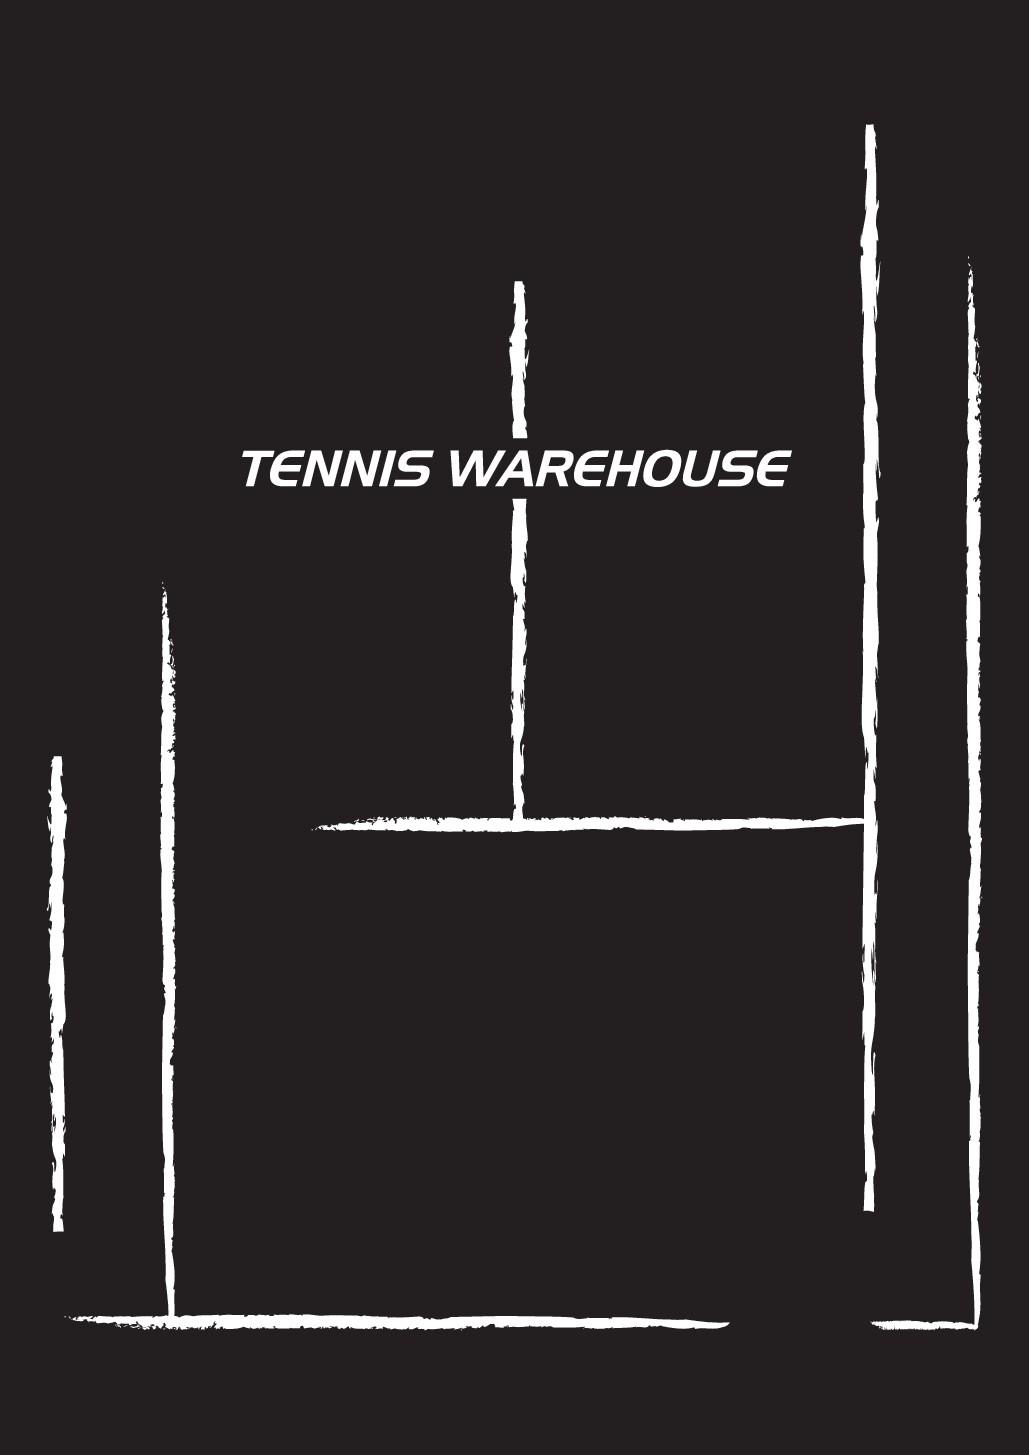 Tennis Warehouse Apparel Contest